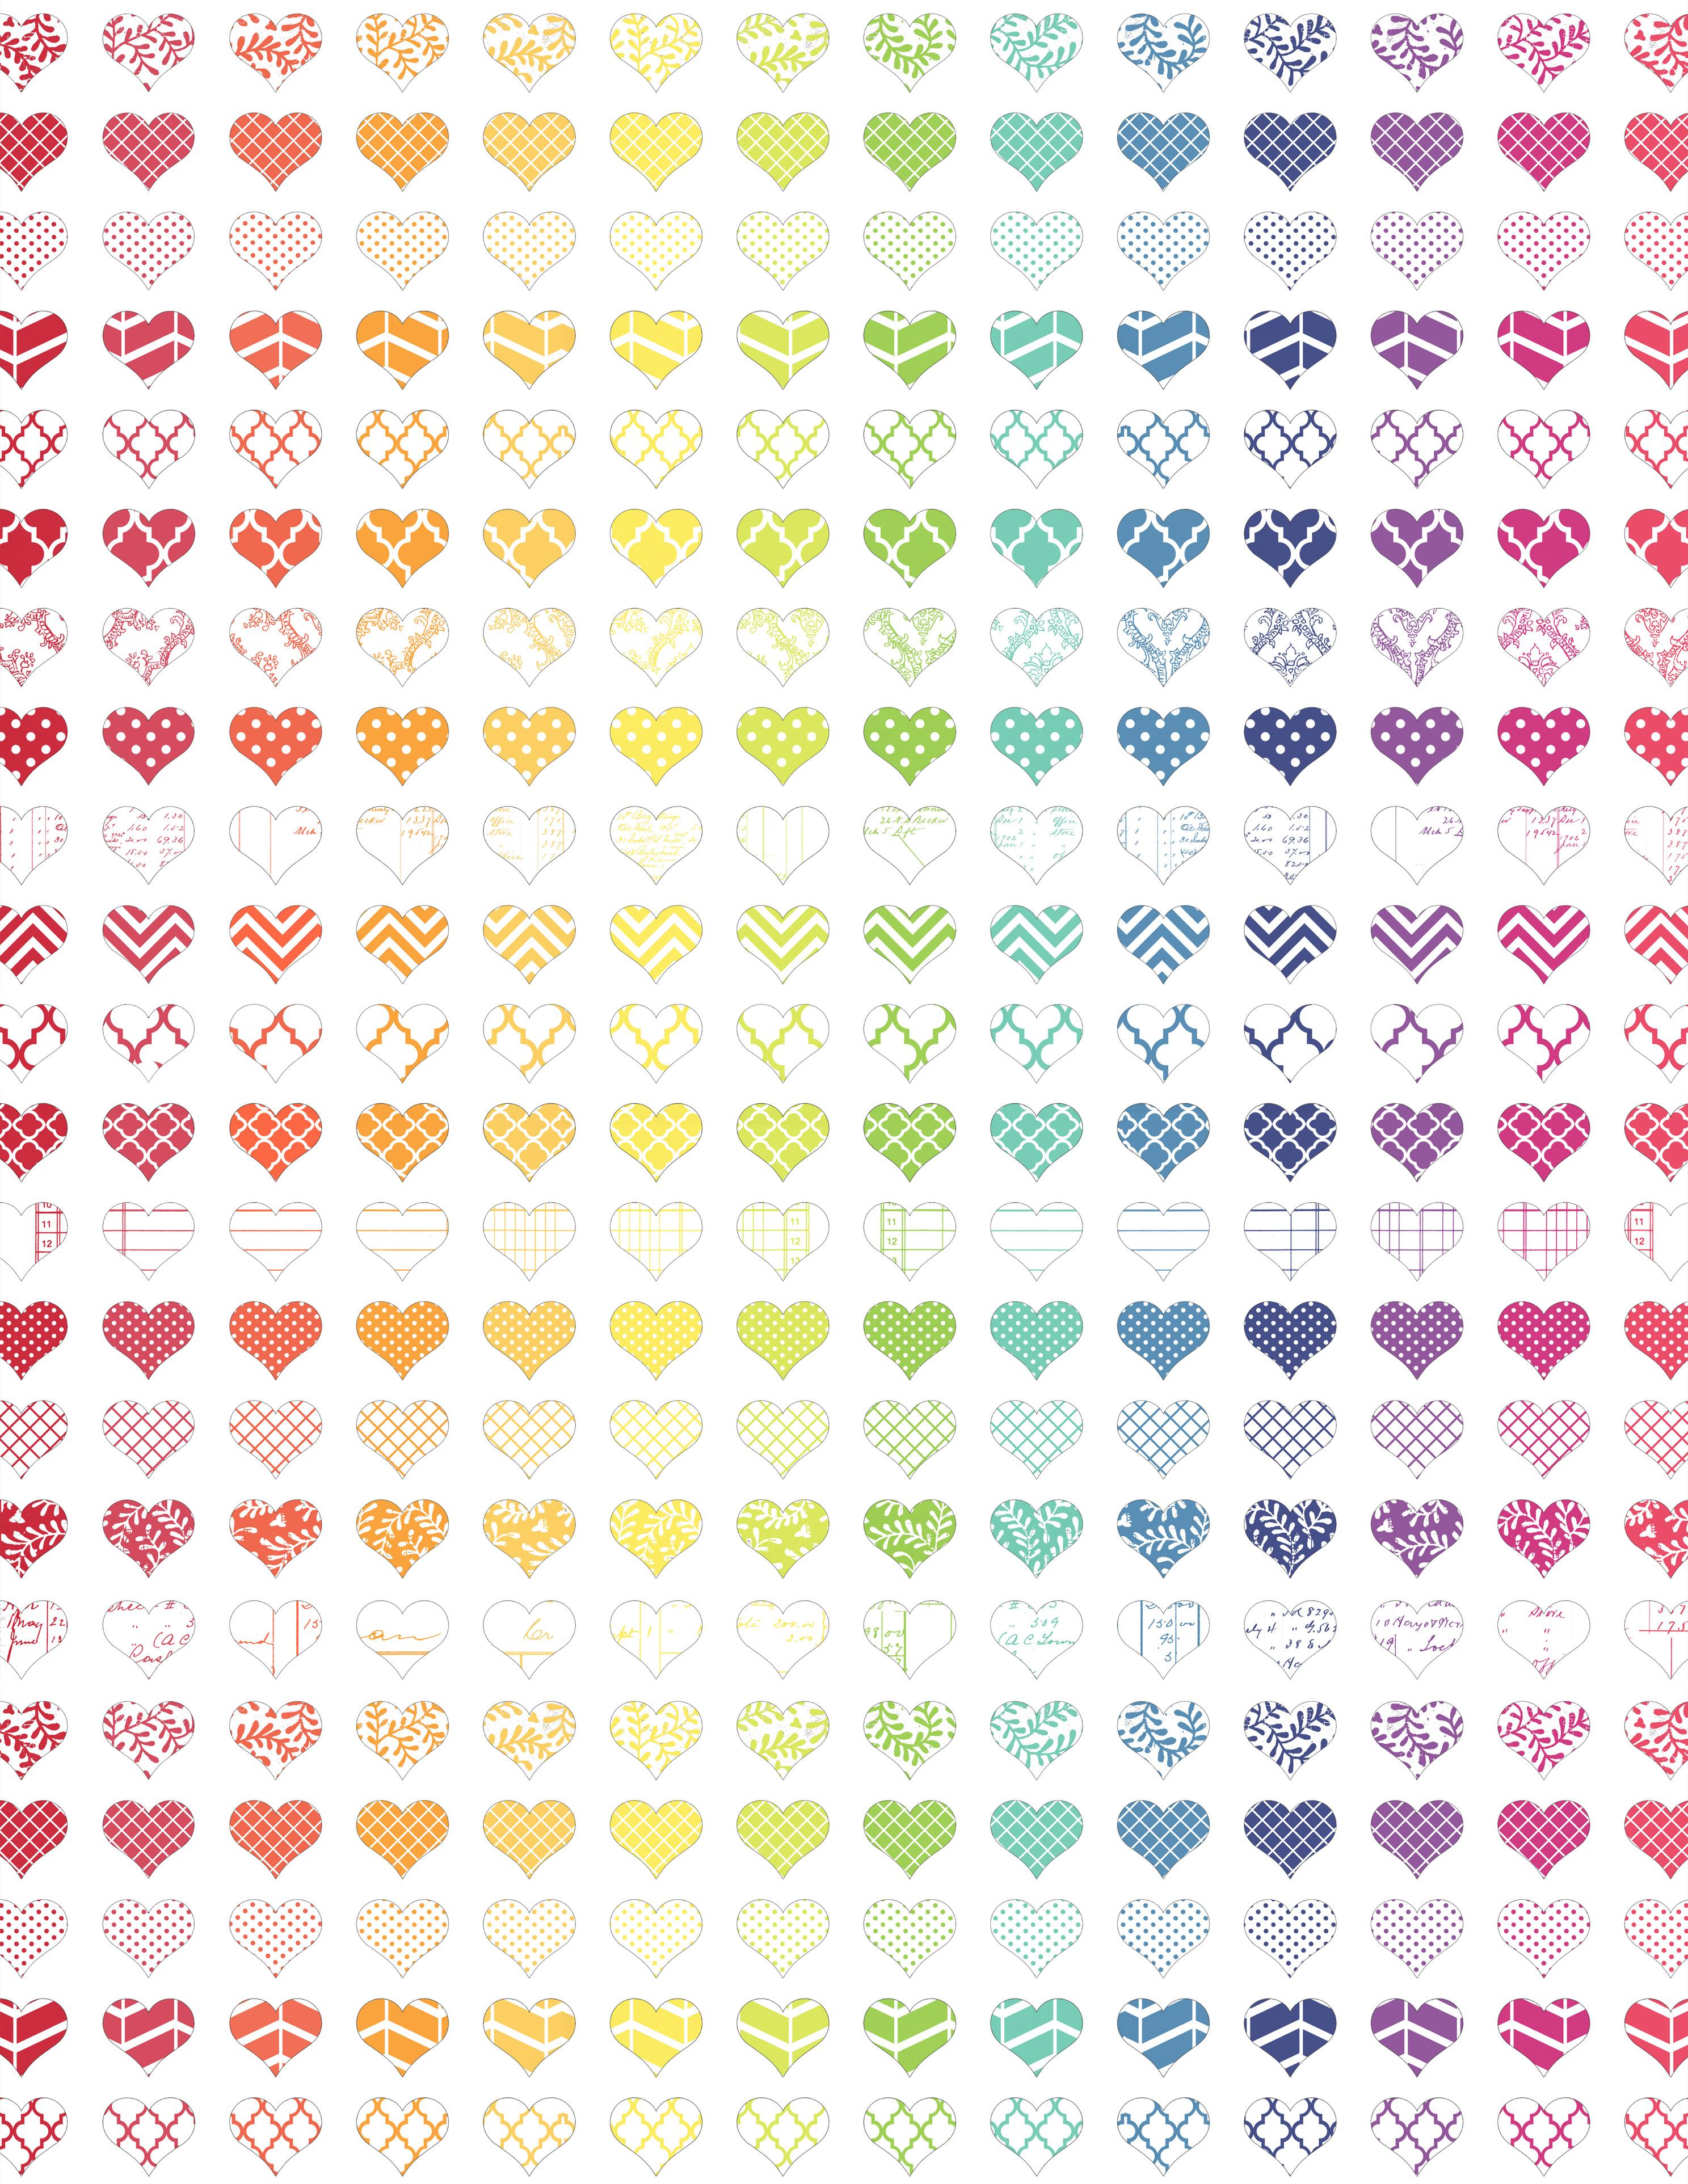 JPG rainbow hearts standard size melstampz